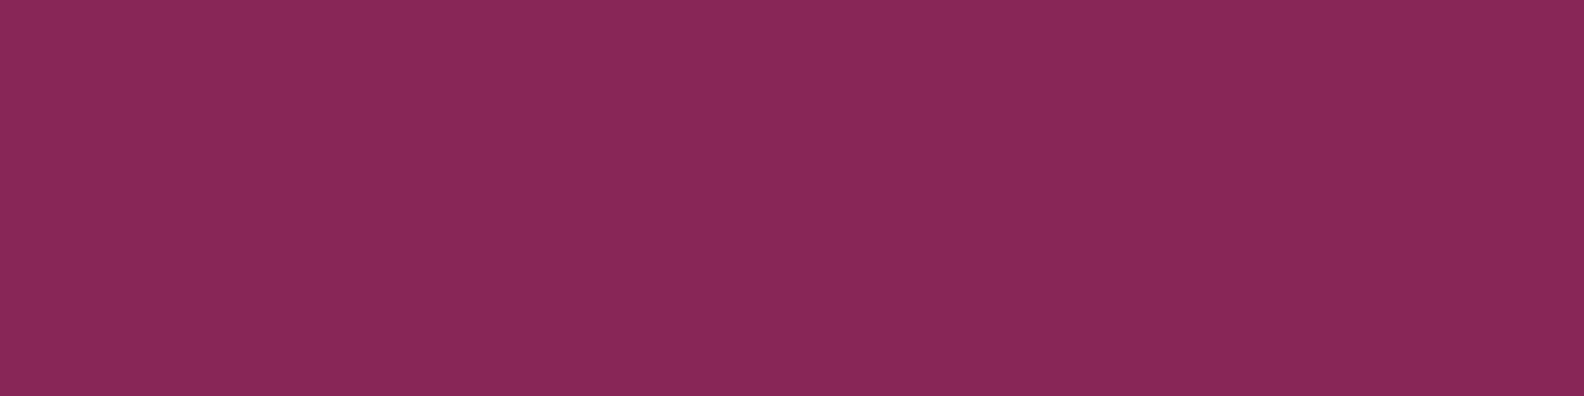 1584x396 Dark Raspberry Solid Color Background